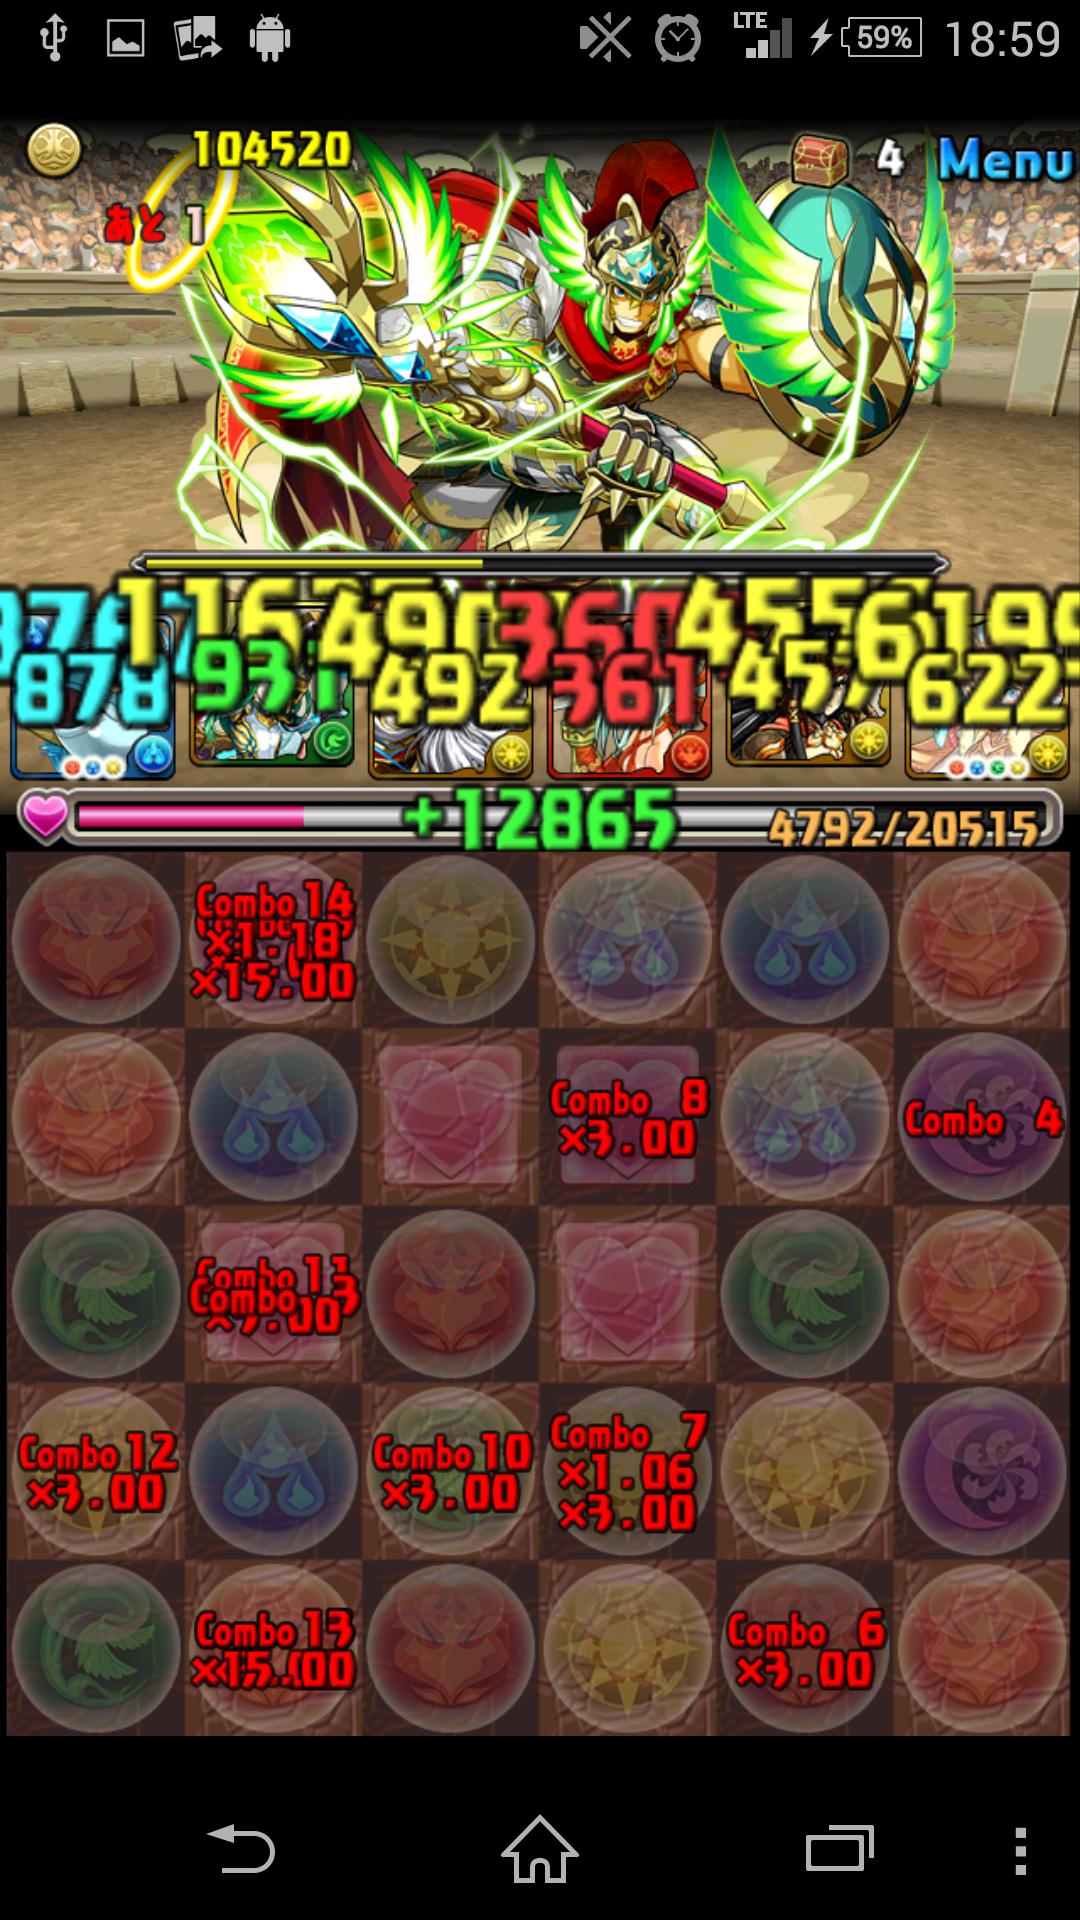 Screenshot_2014-09-09-18-59-02.png